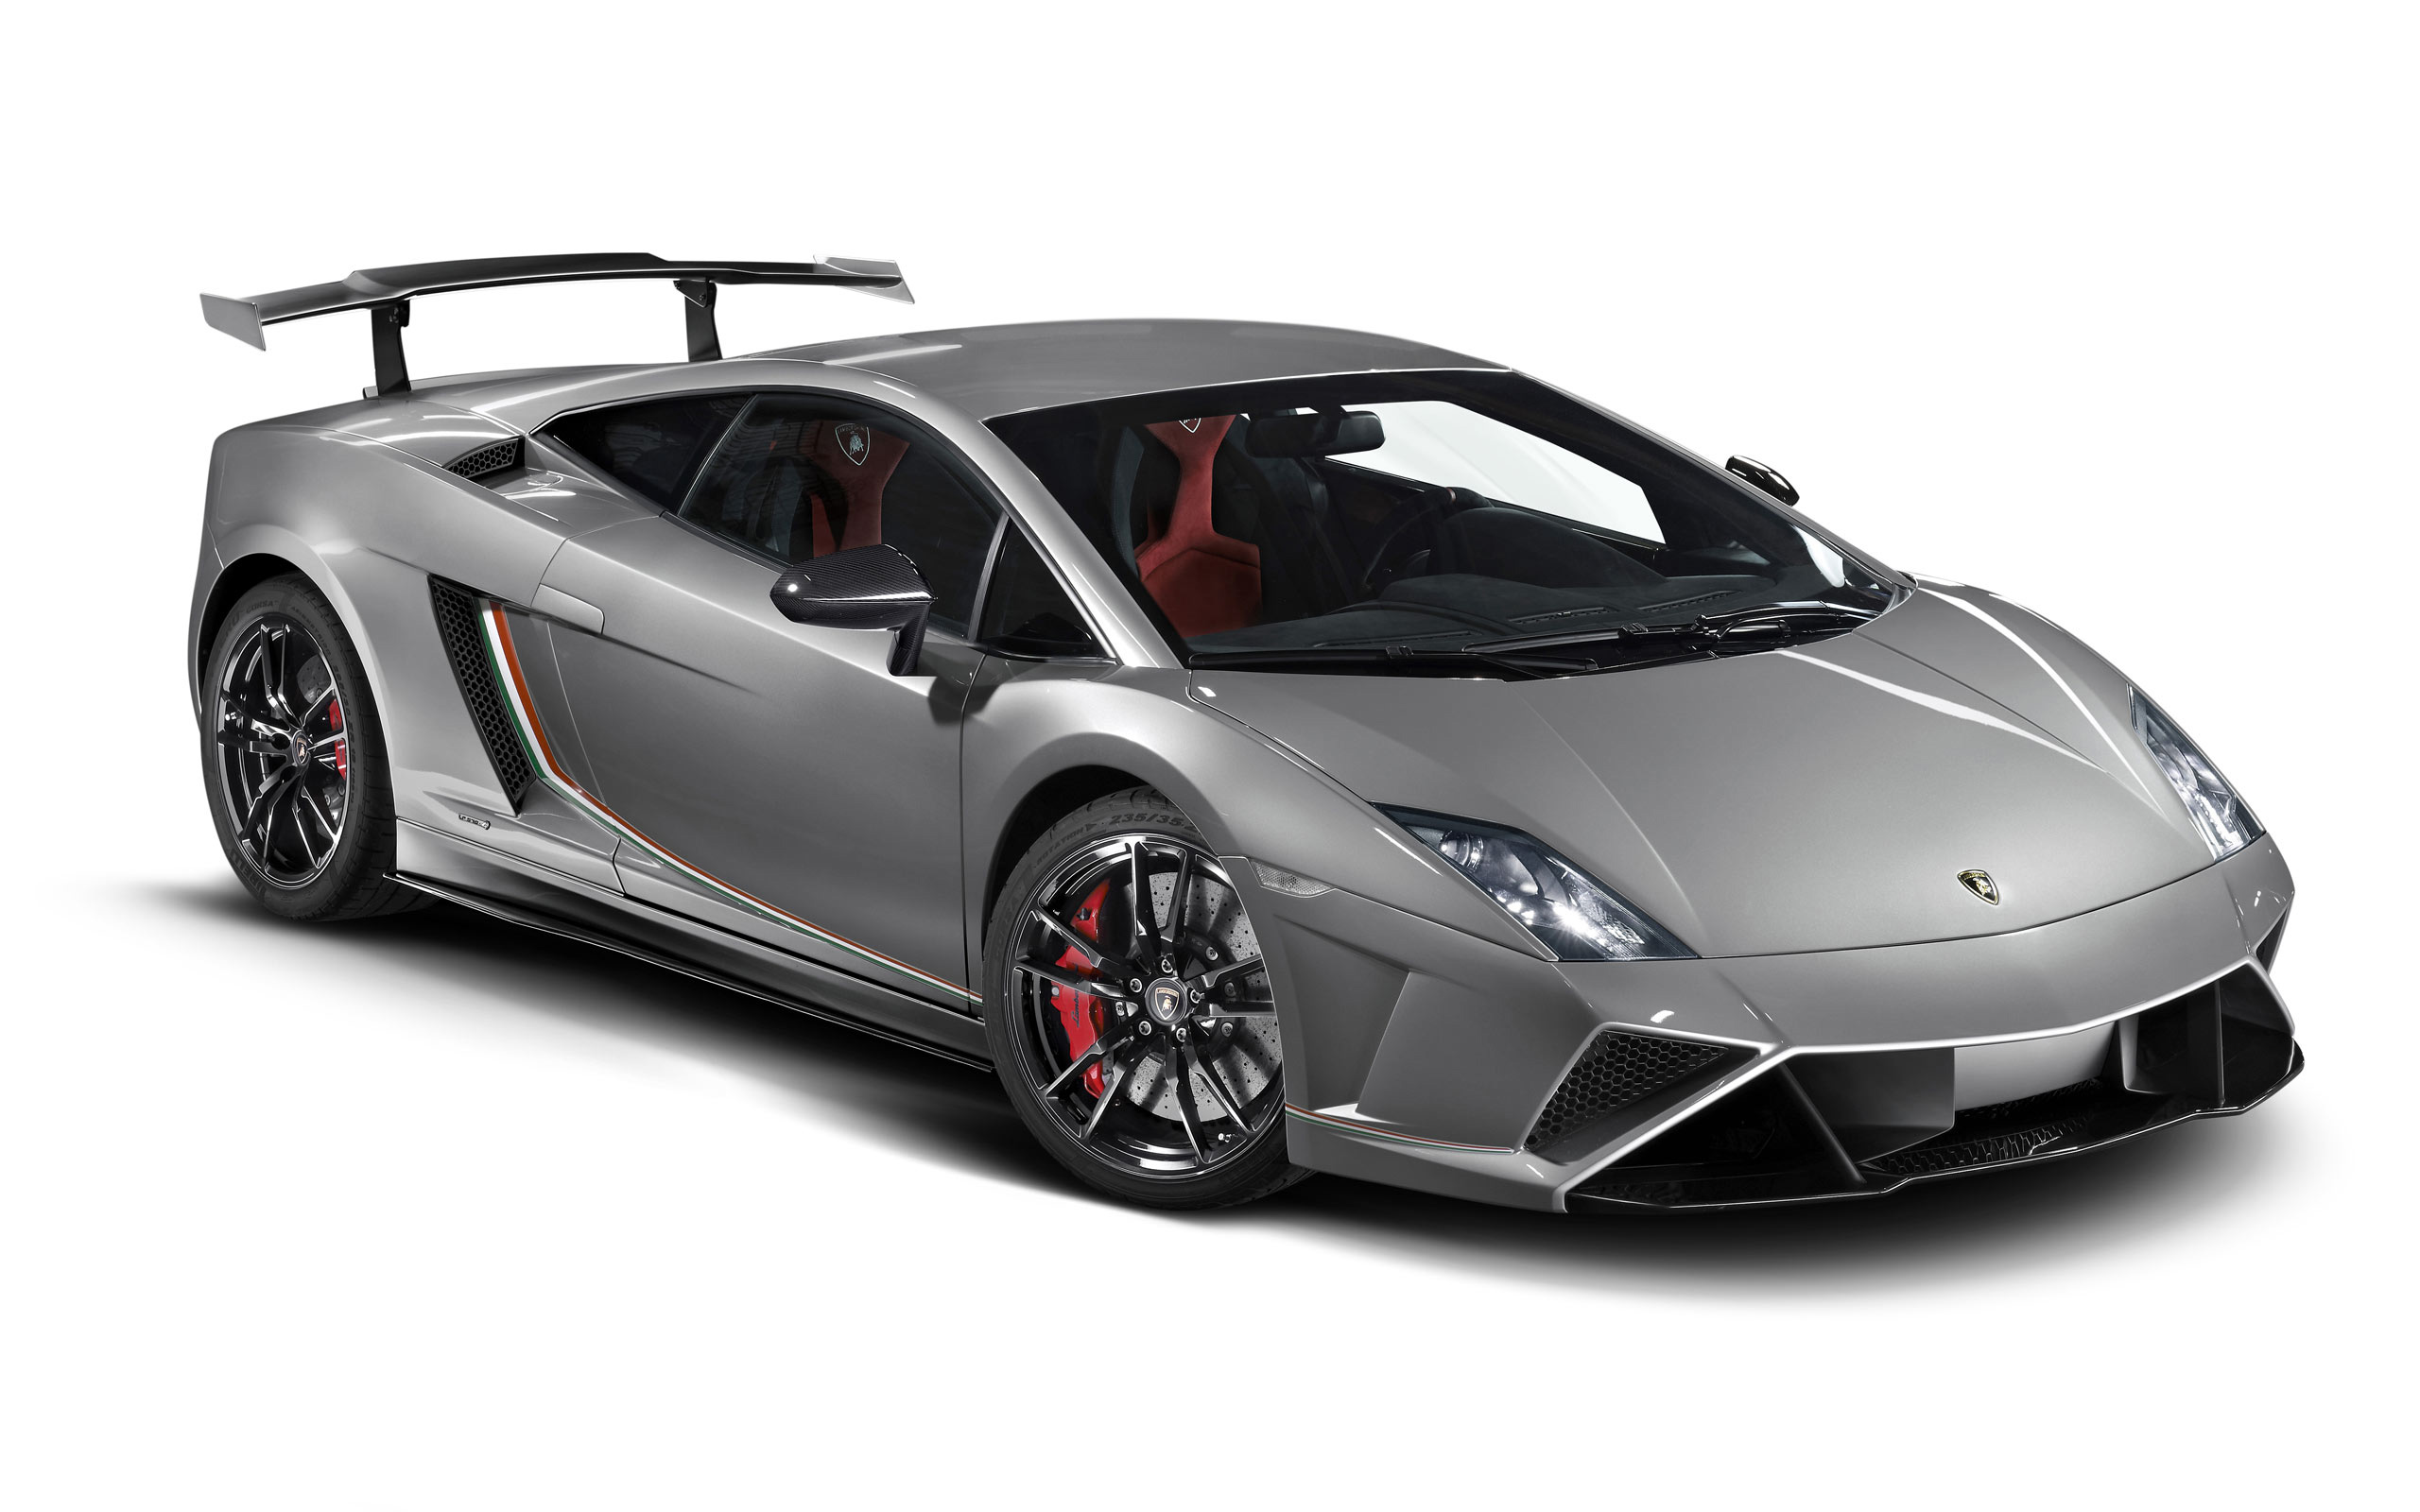 2013 Lamborghini Gallardo Lp 570 4 Squadra Corse Wallpaper Hd Car Wallpapers Id 3599